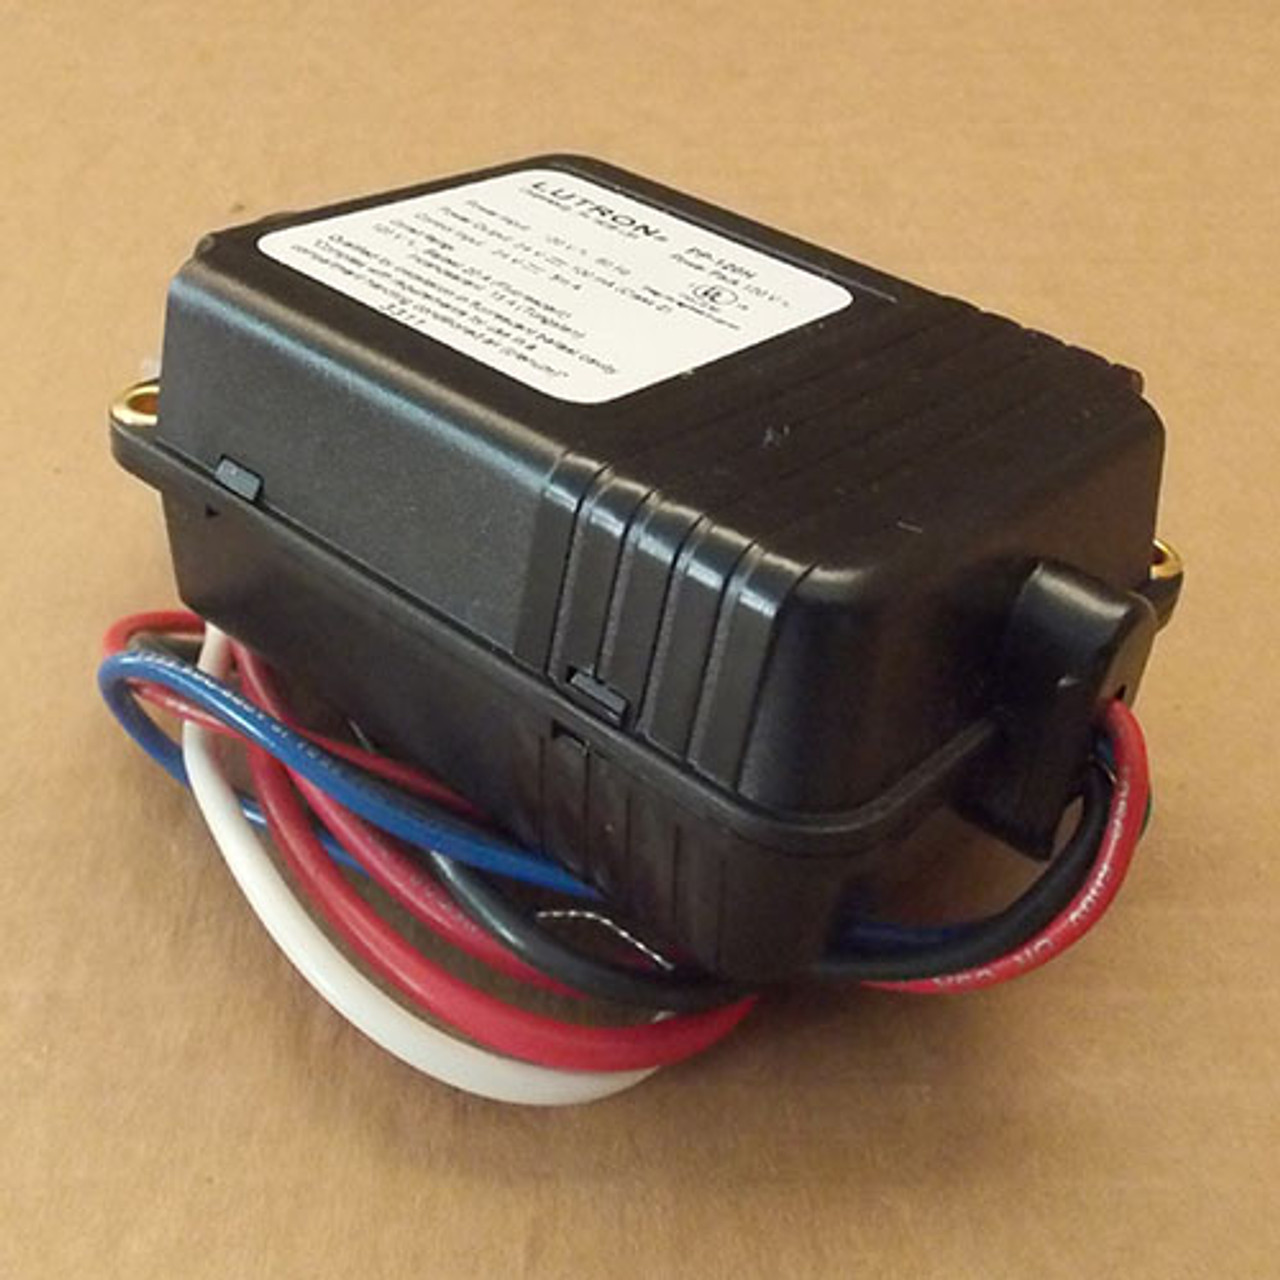 Lutron PP-120H Power Pack 120VAC 24VDC Occupancy Sensor Power Supply - New